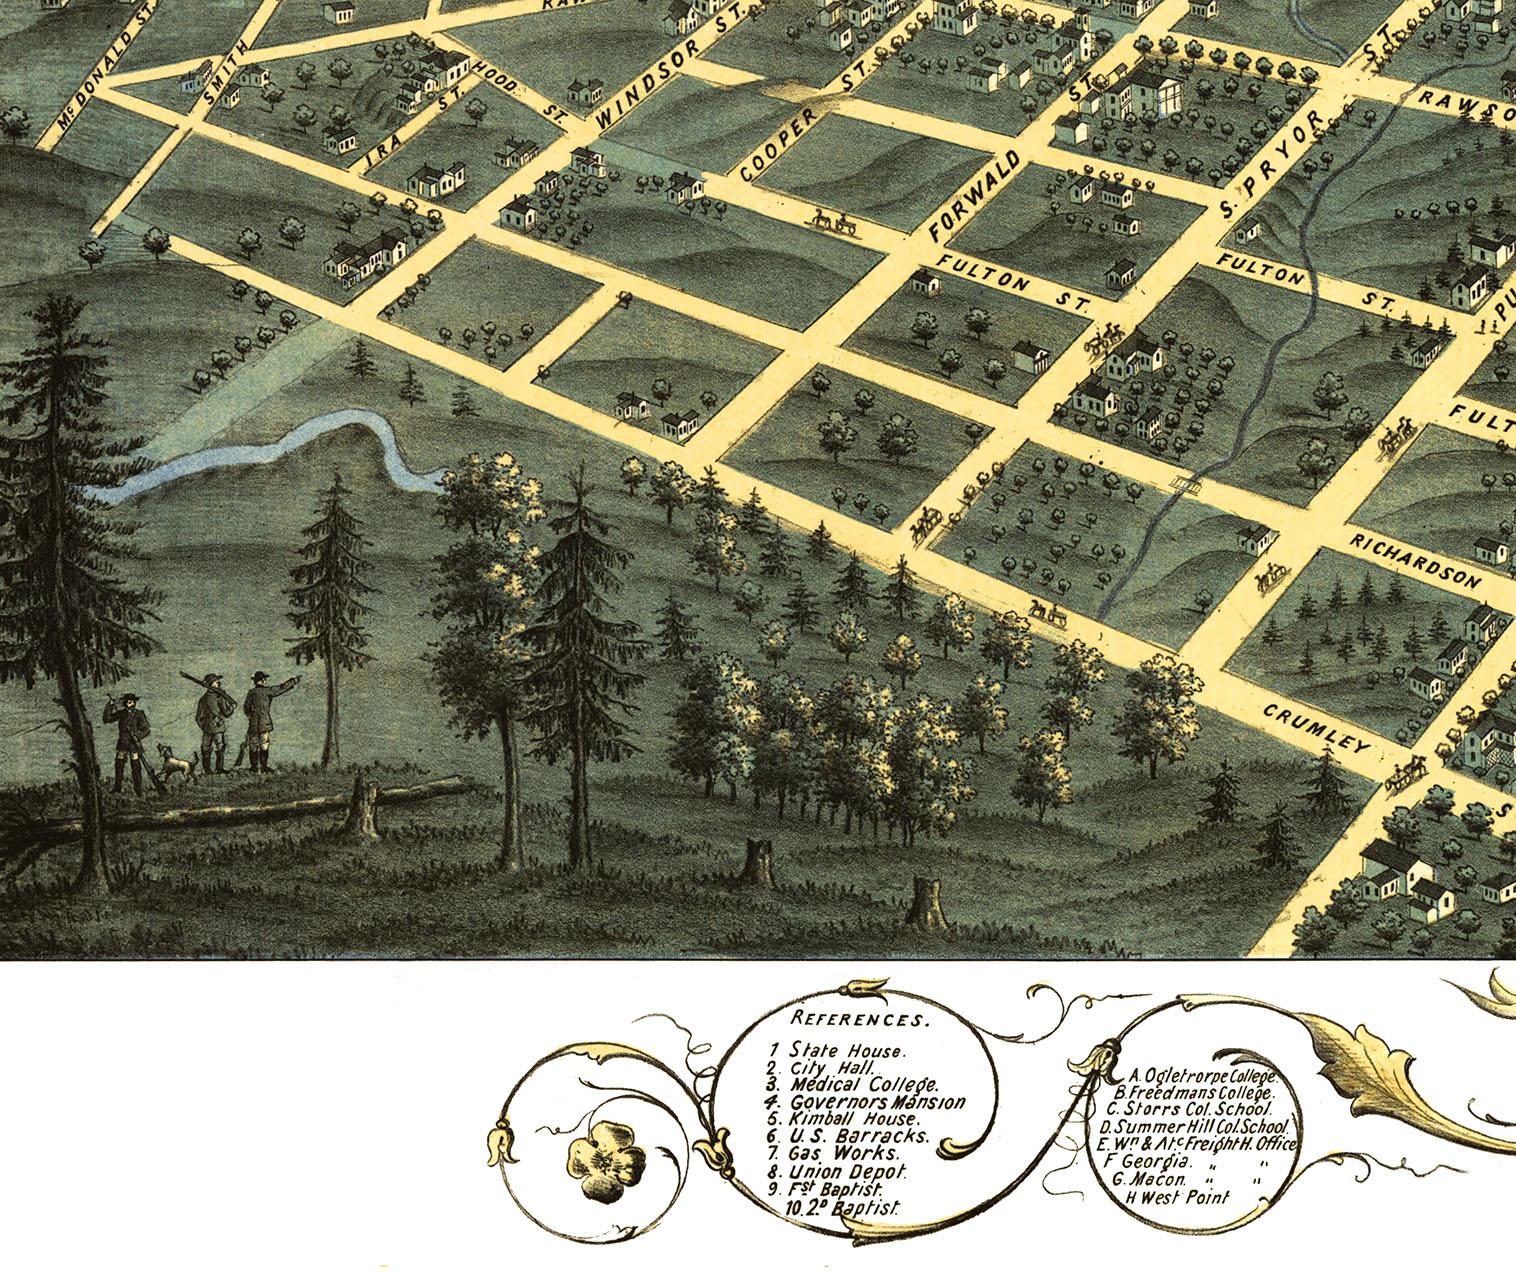 Atlanta Ga In 1871 Bird 39 S Eye View Map Aerial Panorama Vintage Antique Reproduction